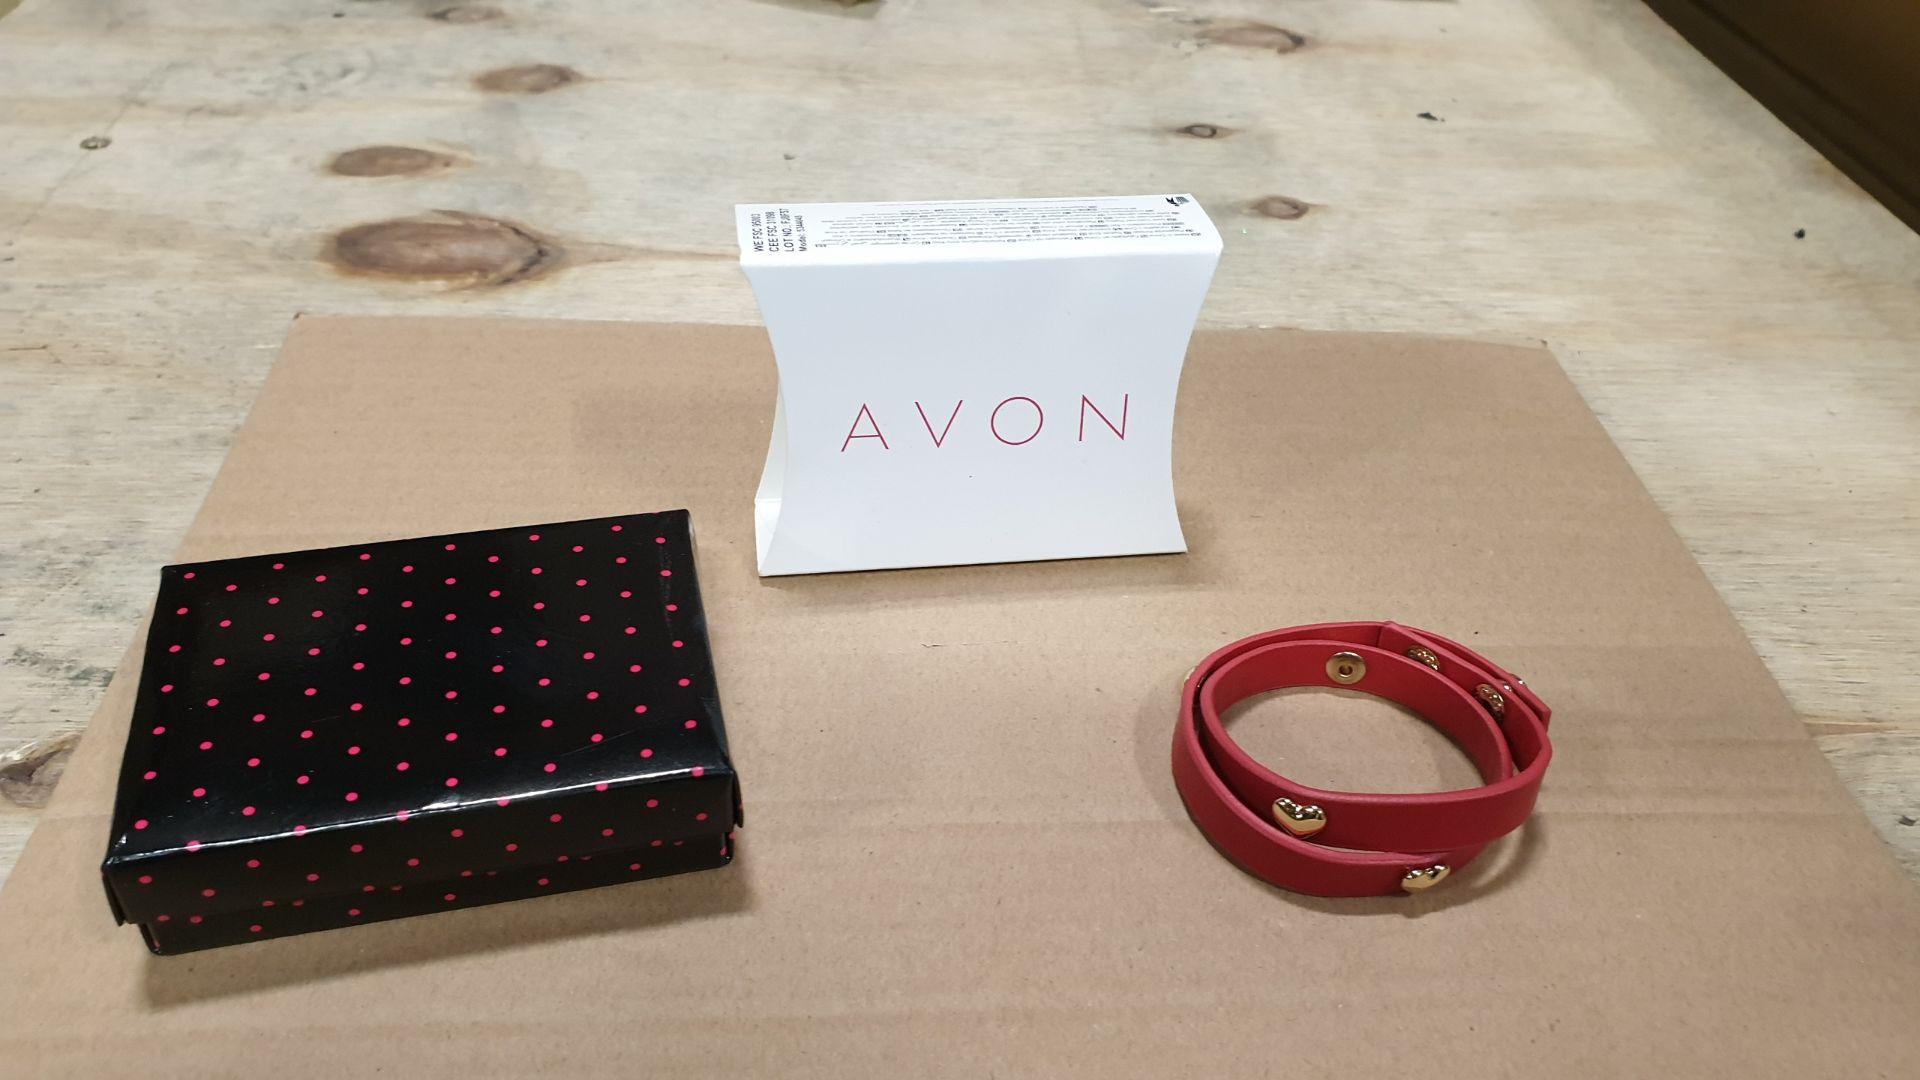 132 X AVON RONNI BRACELET - RED